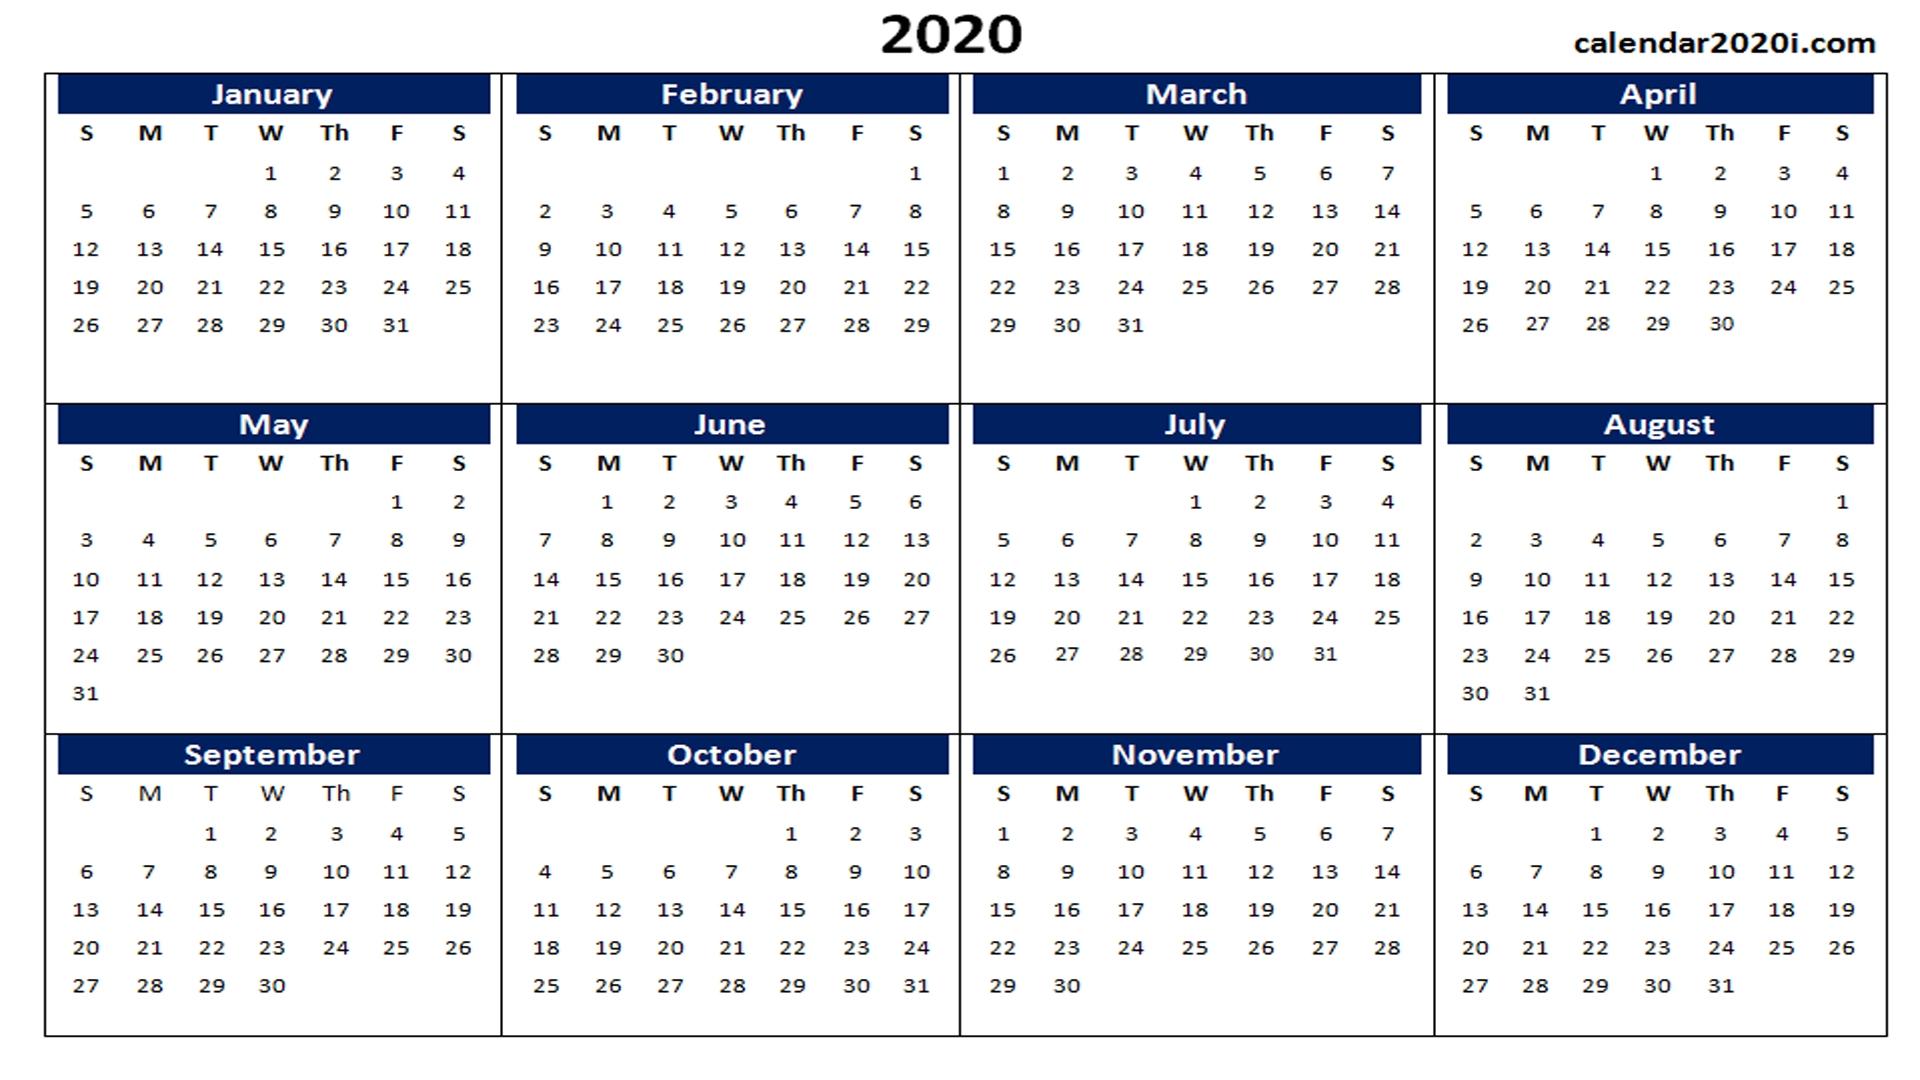 Blank 2020 Calendar Printable Templates | Calendar 2020 for Excel Formula For Calendar Year 2020